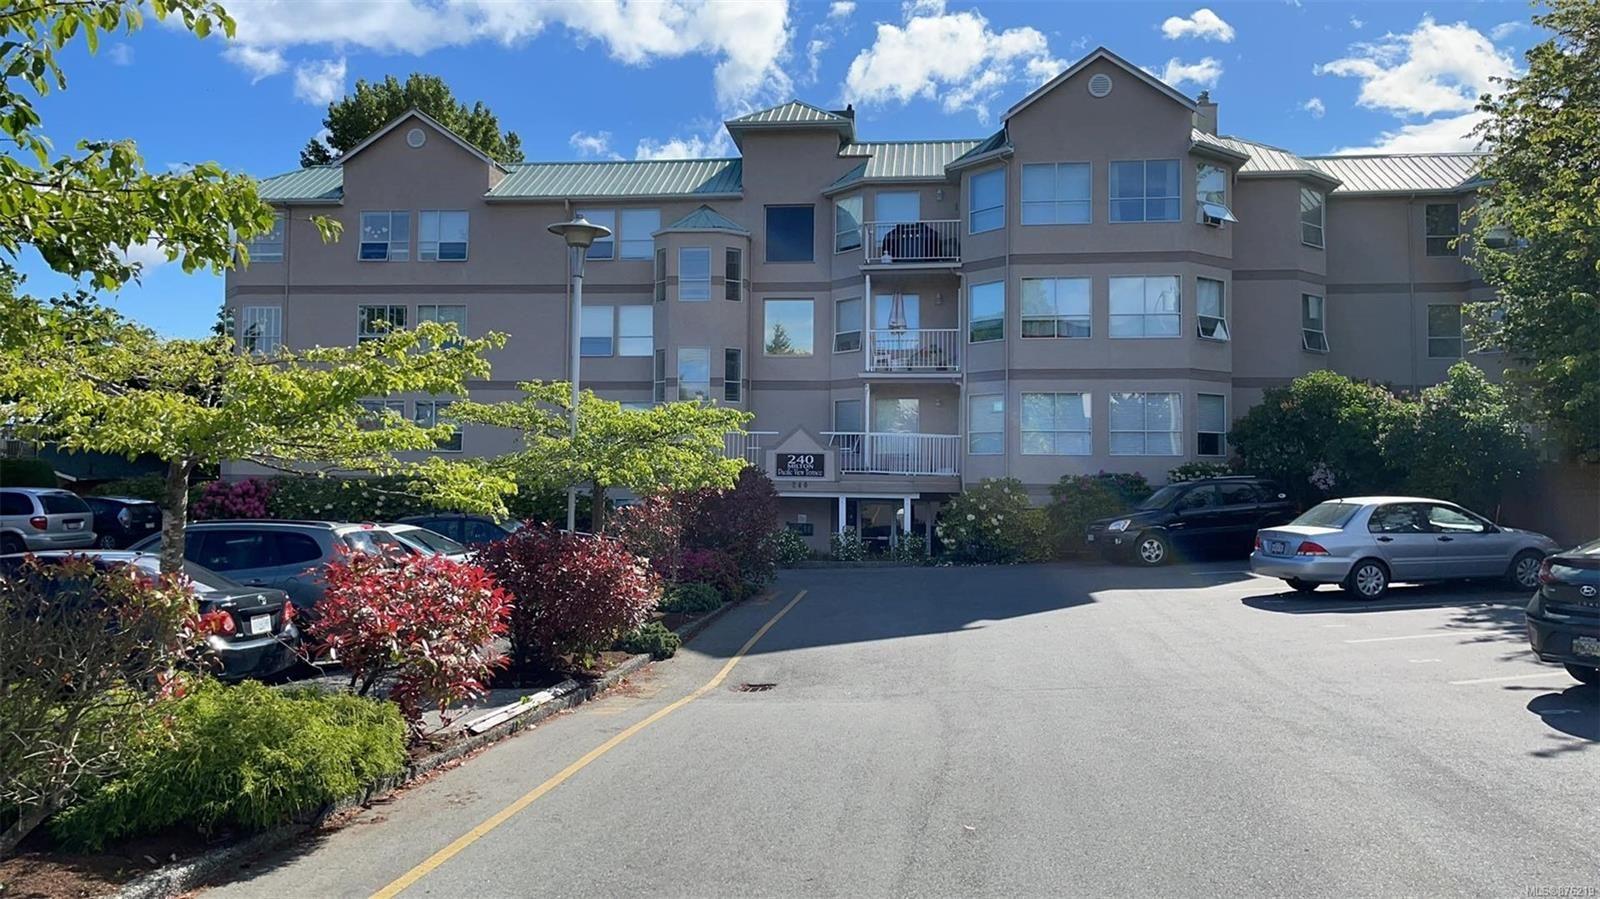 Main Photo: 204 240 Milton St in : Na Old City Condo for sale (Nanaimo)  : MLS®# 876219